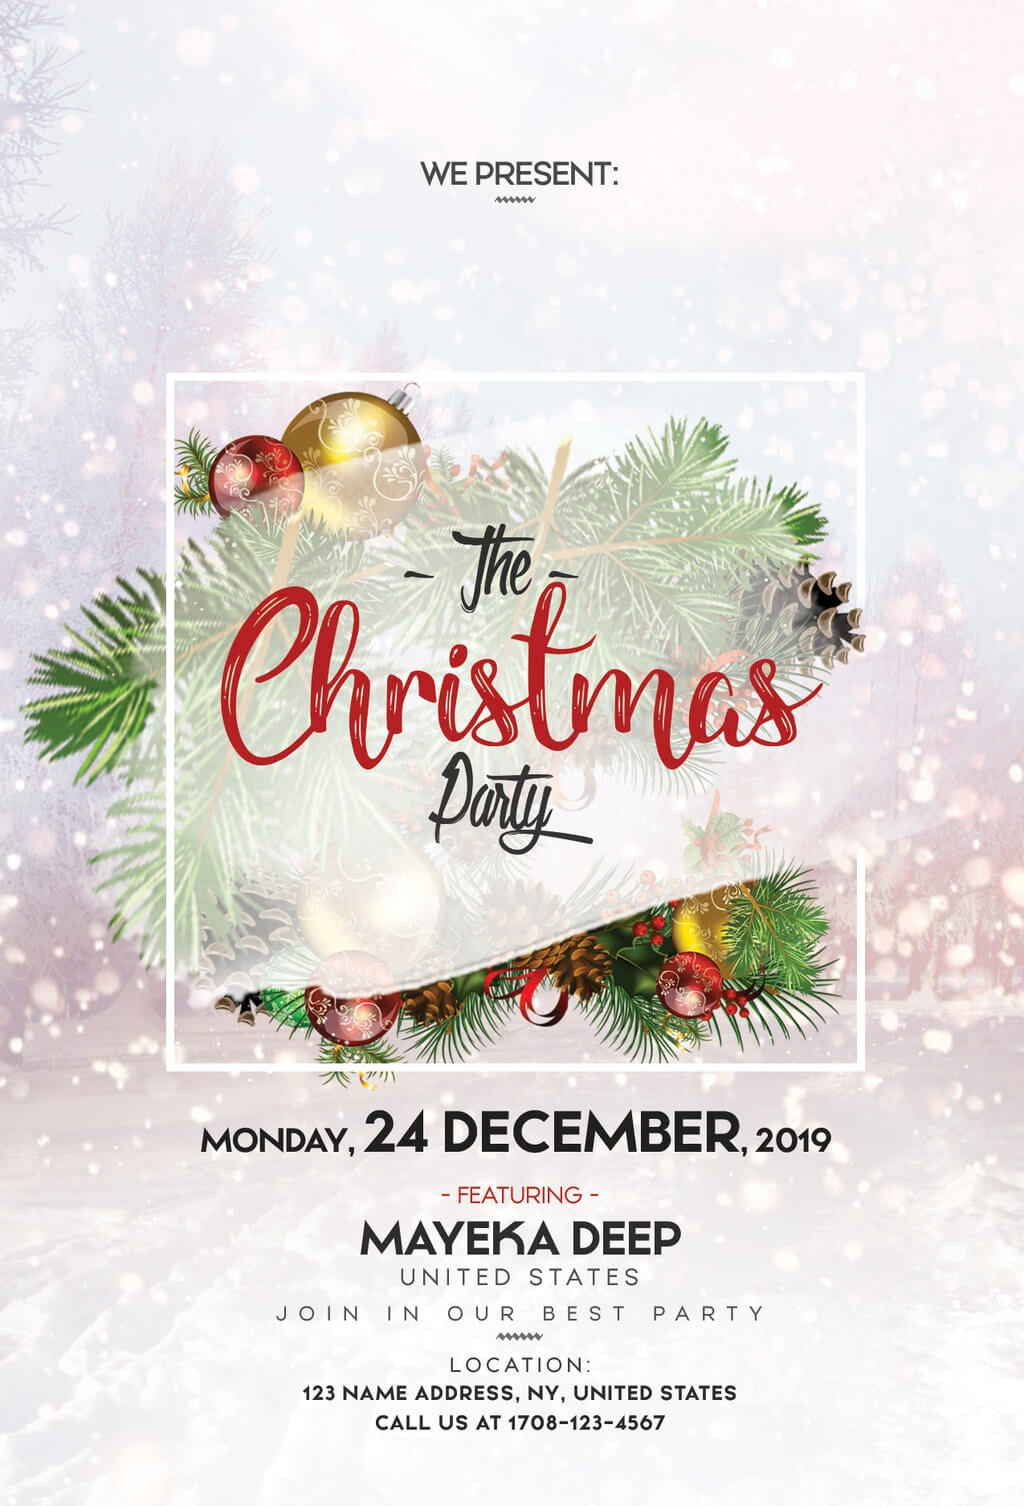 Merry Christmas Free Psd Flyer Template | Freebiedesign Inside Christmas Brochure Templates Free